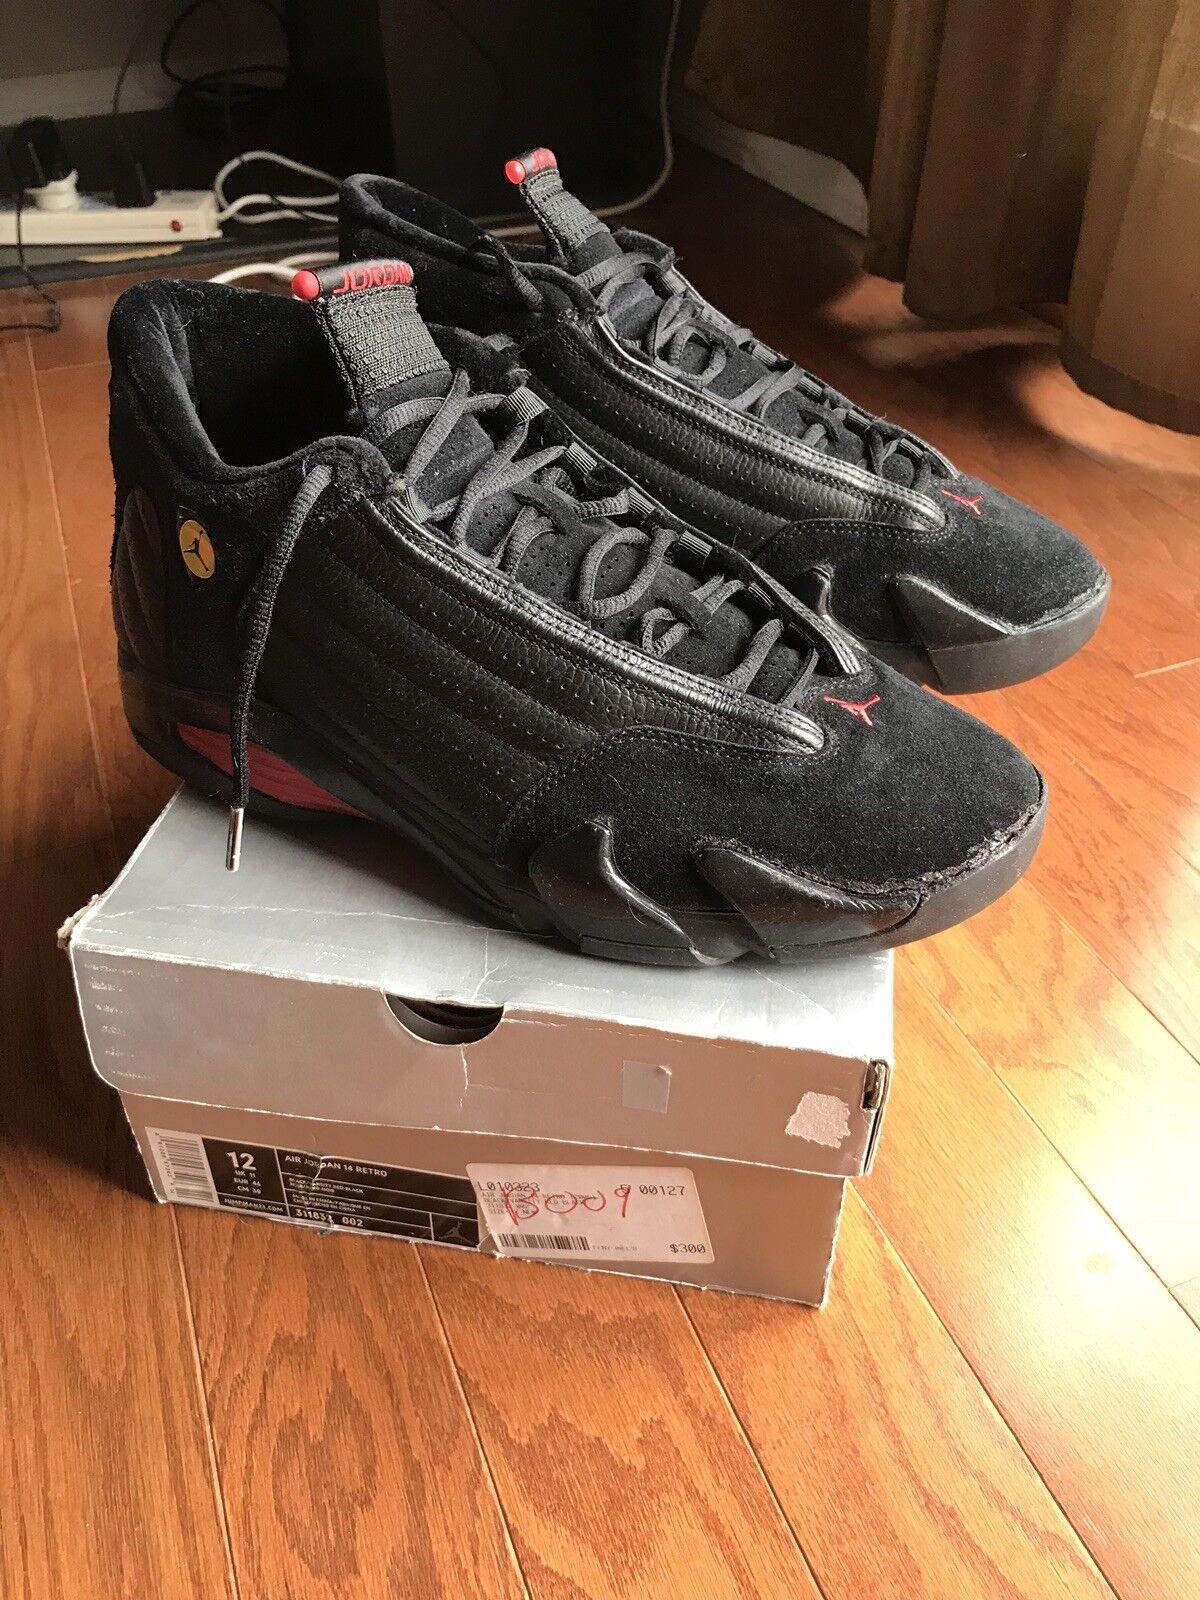 Jordan 14 & Jordan 13 Both Size Size Size 12 202d8a